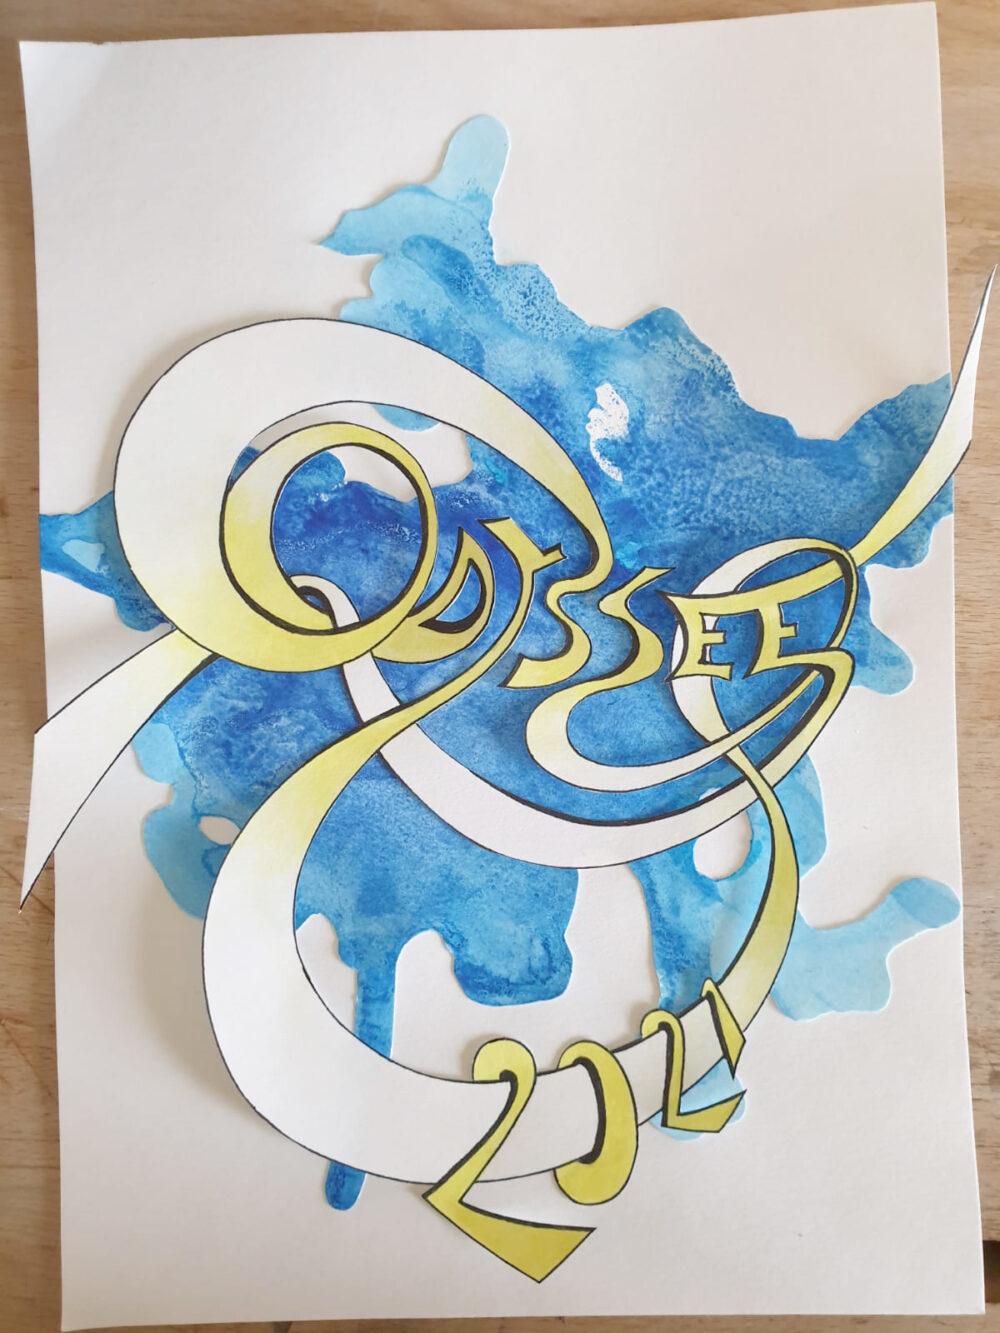 Verschnörkelter Schriftzug Odyssee 2021